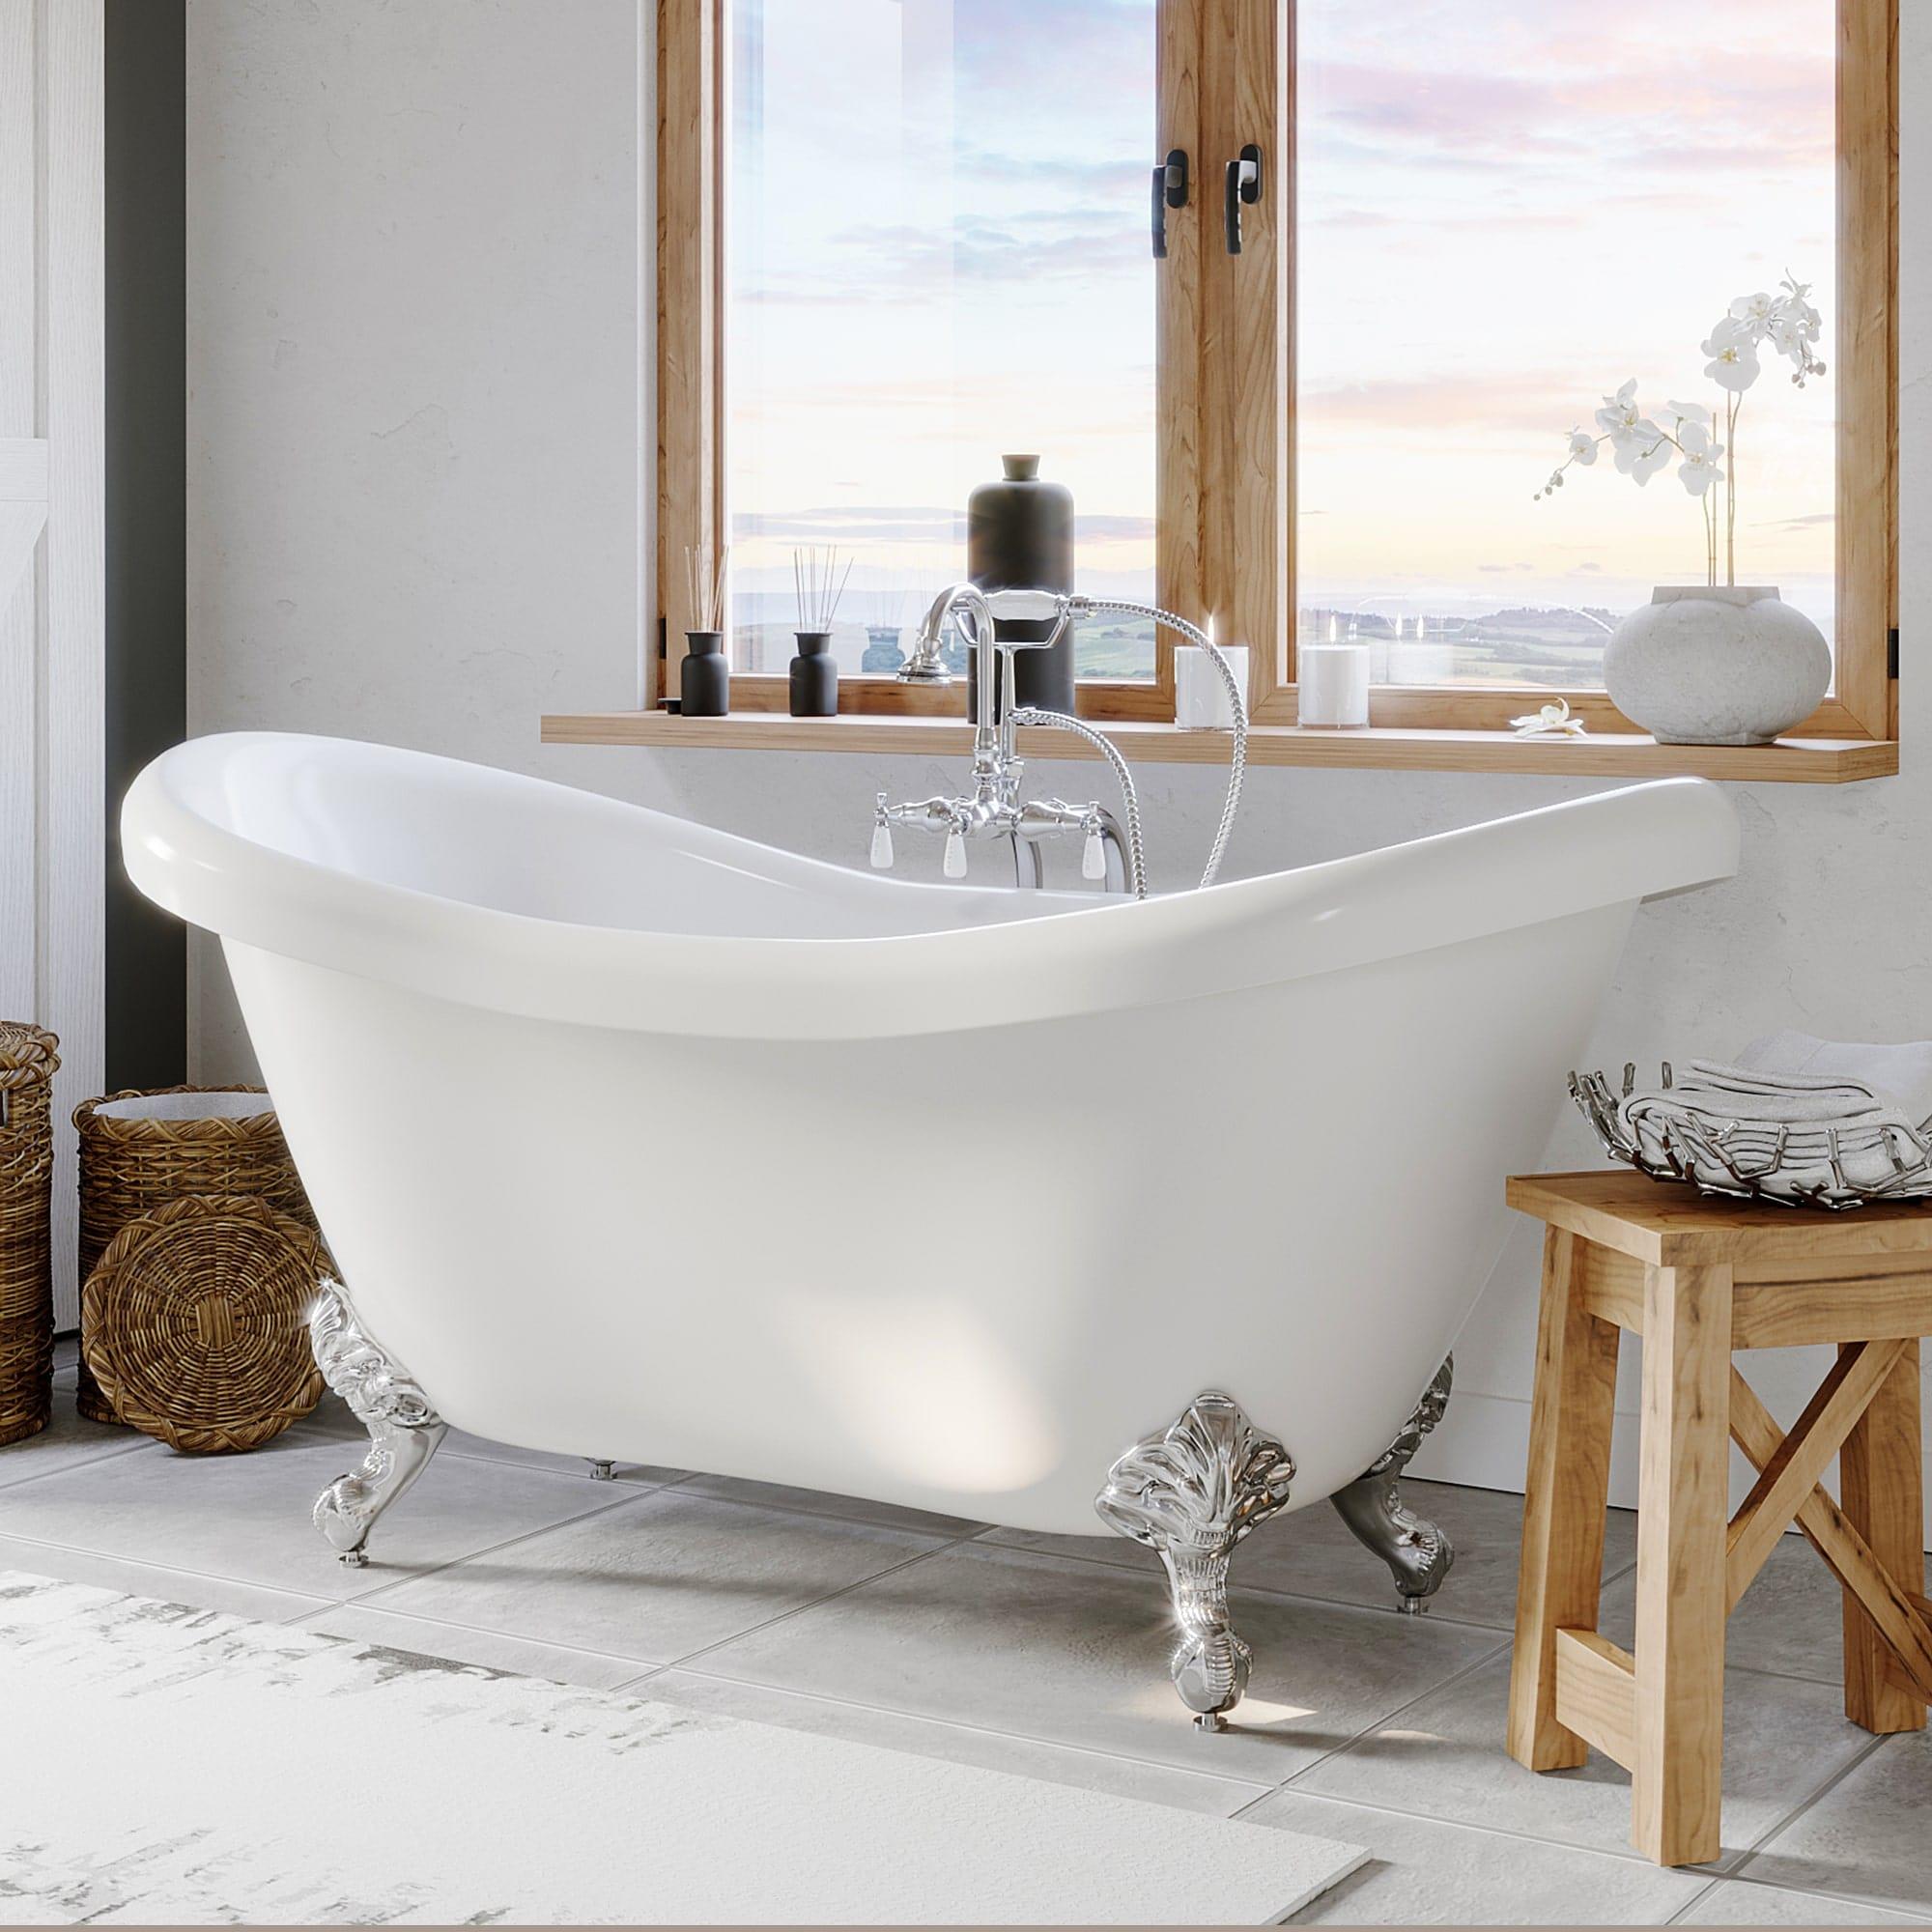 freestanding tub, double slipper tub clawfoot tub,